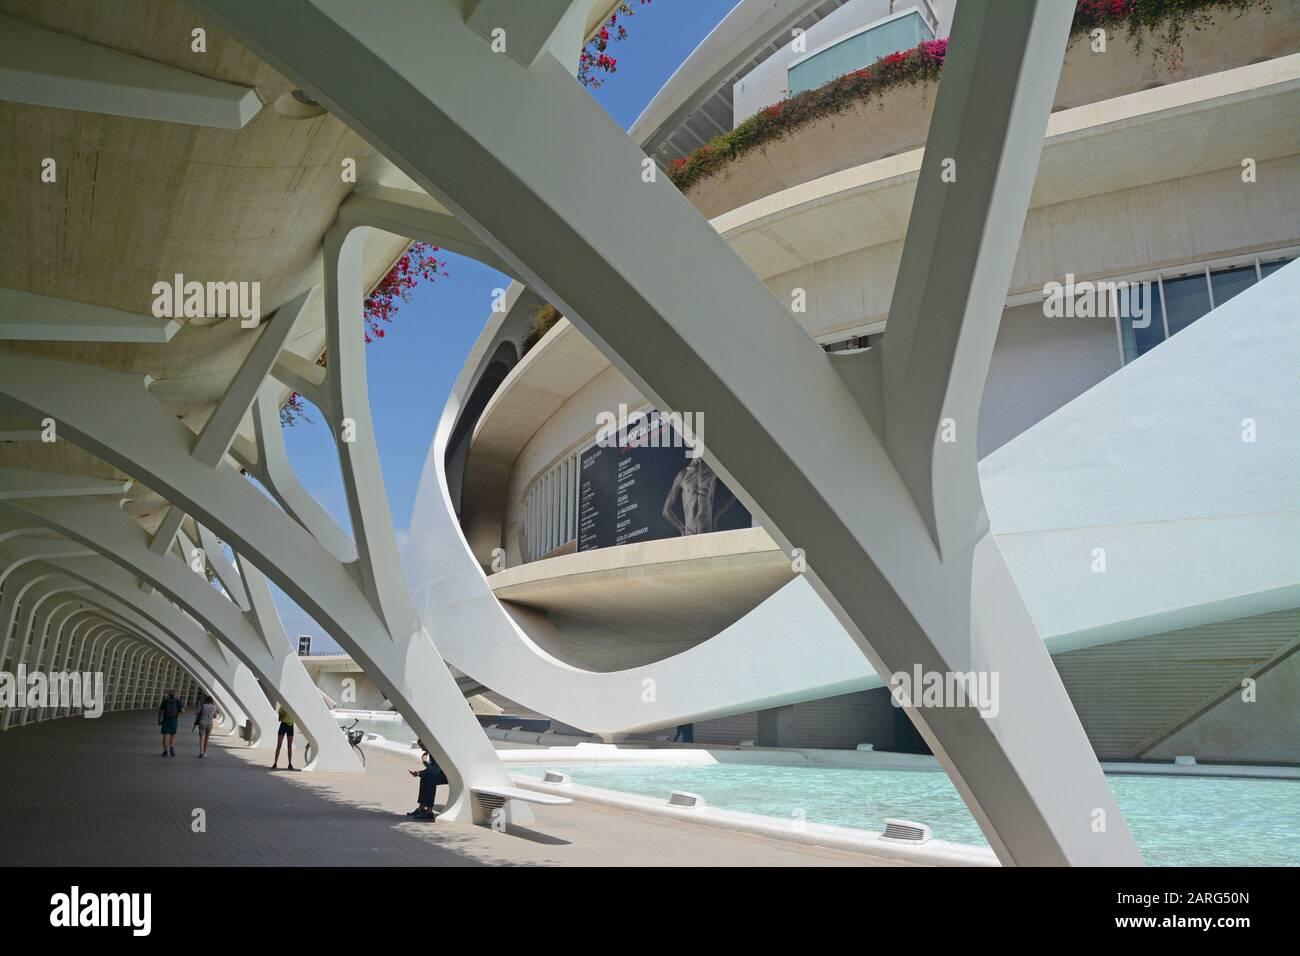 Palau de les Arts Reina Sofia. Ciudad de las Artes y las Ciencias, un complexe architectural, culturel et de divertissement conçu par Santiago Banque D'Images